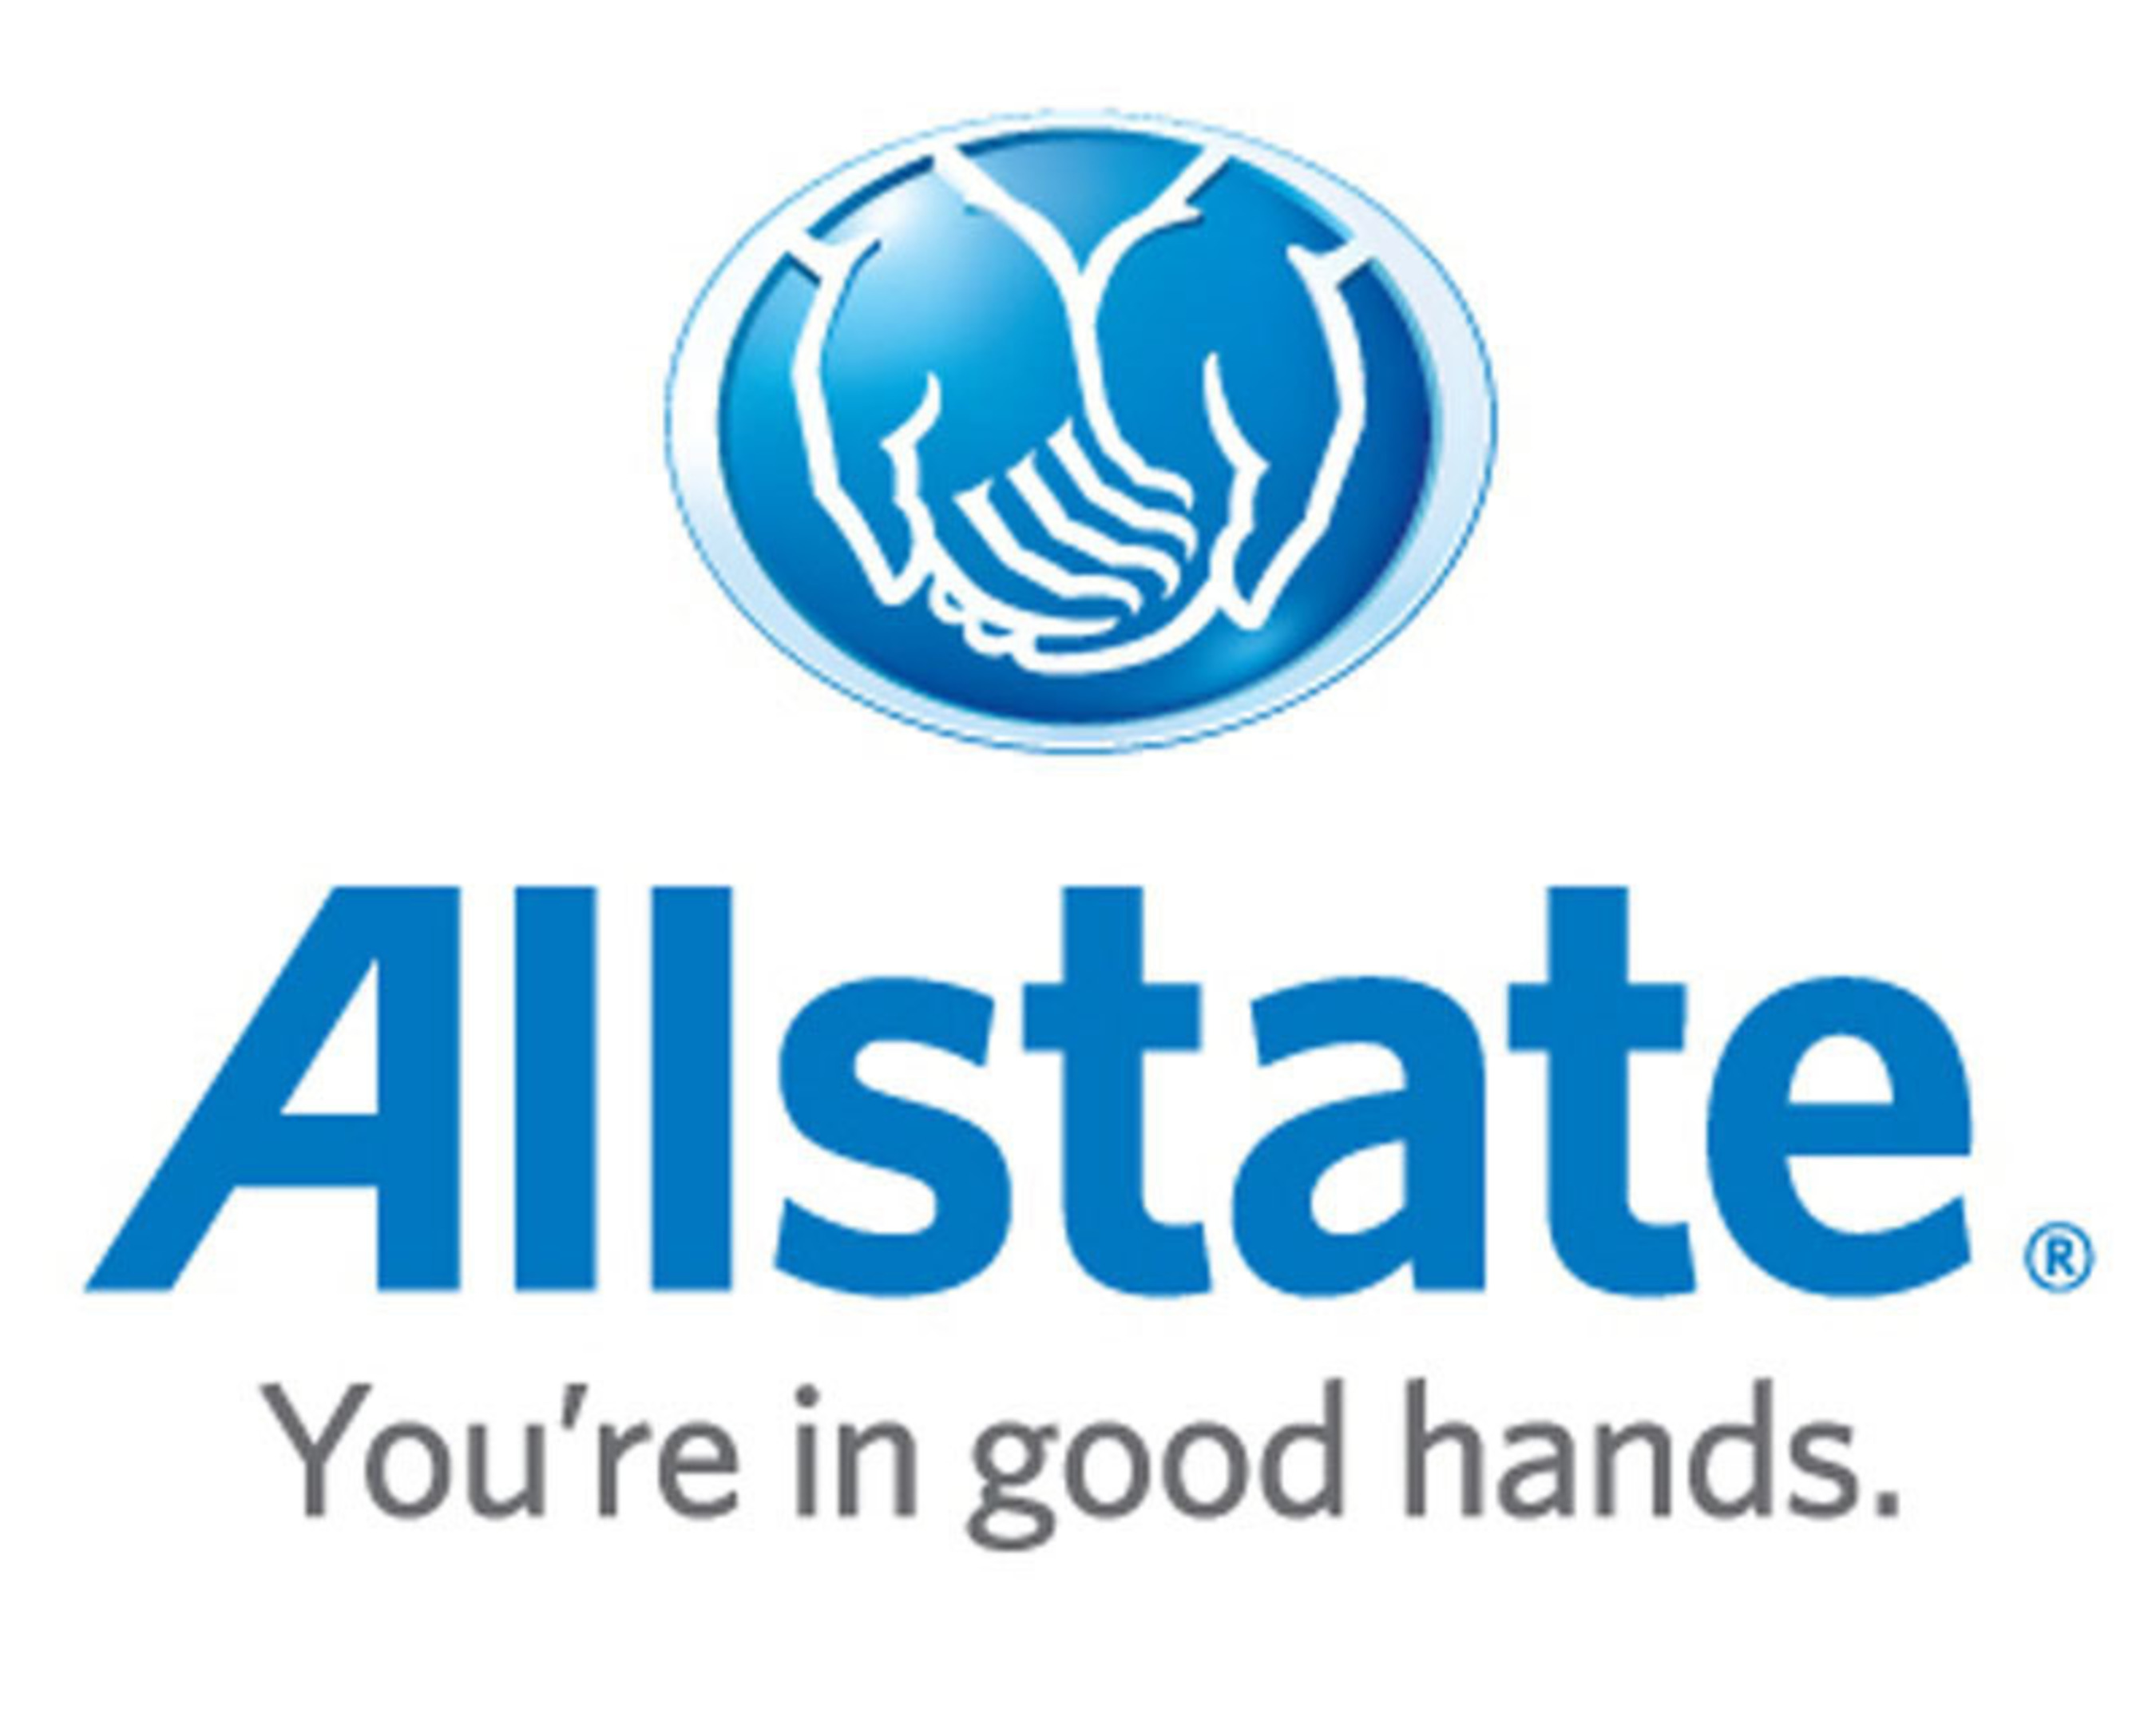 allstate teams up with country music star frankie ballard to rh prnewswire com allstate logo white allstate logo white